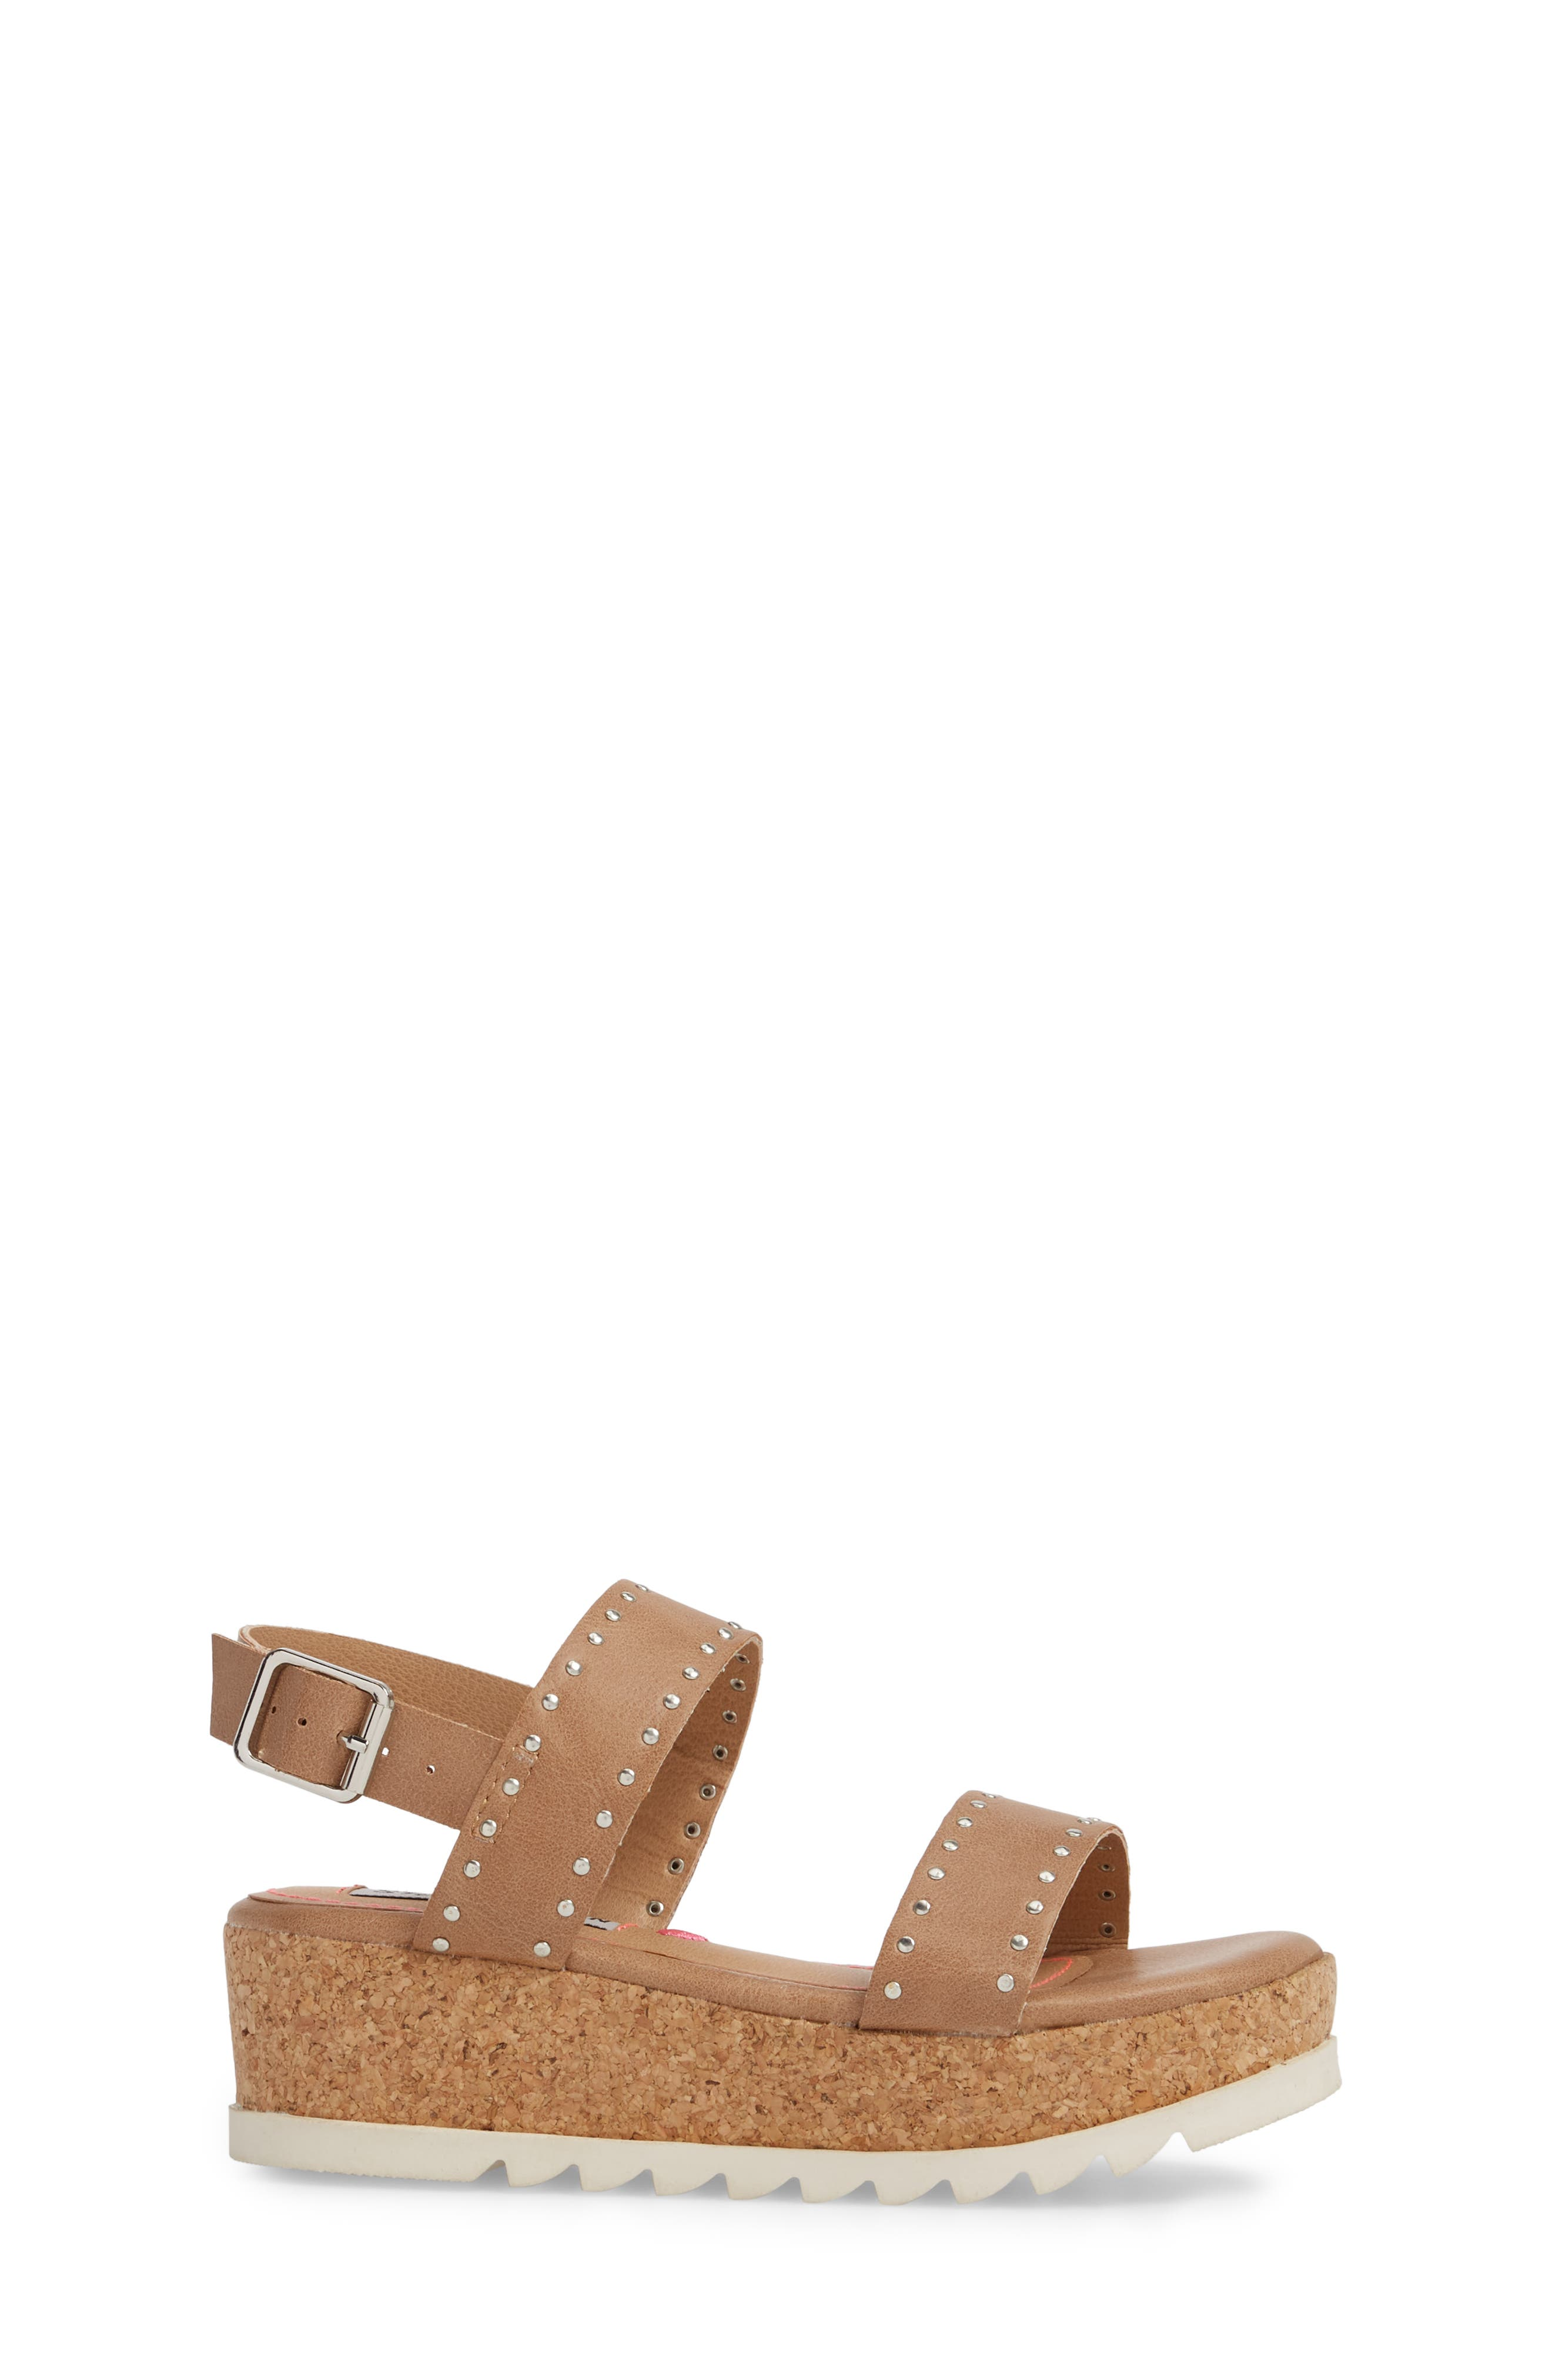 Alternate Image 3  - Steve Madden JKRISTIE Platform Sandal (Little Kid & Big Kid)